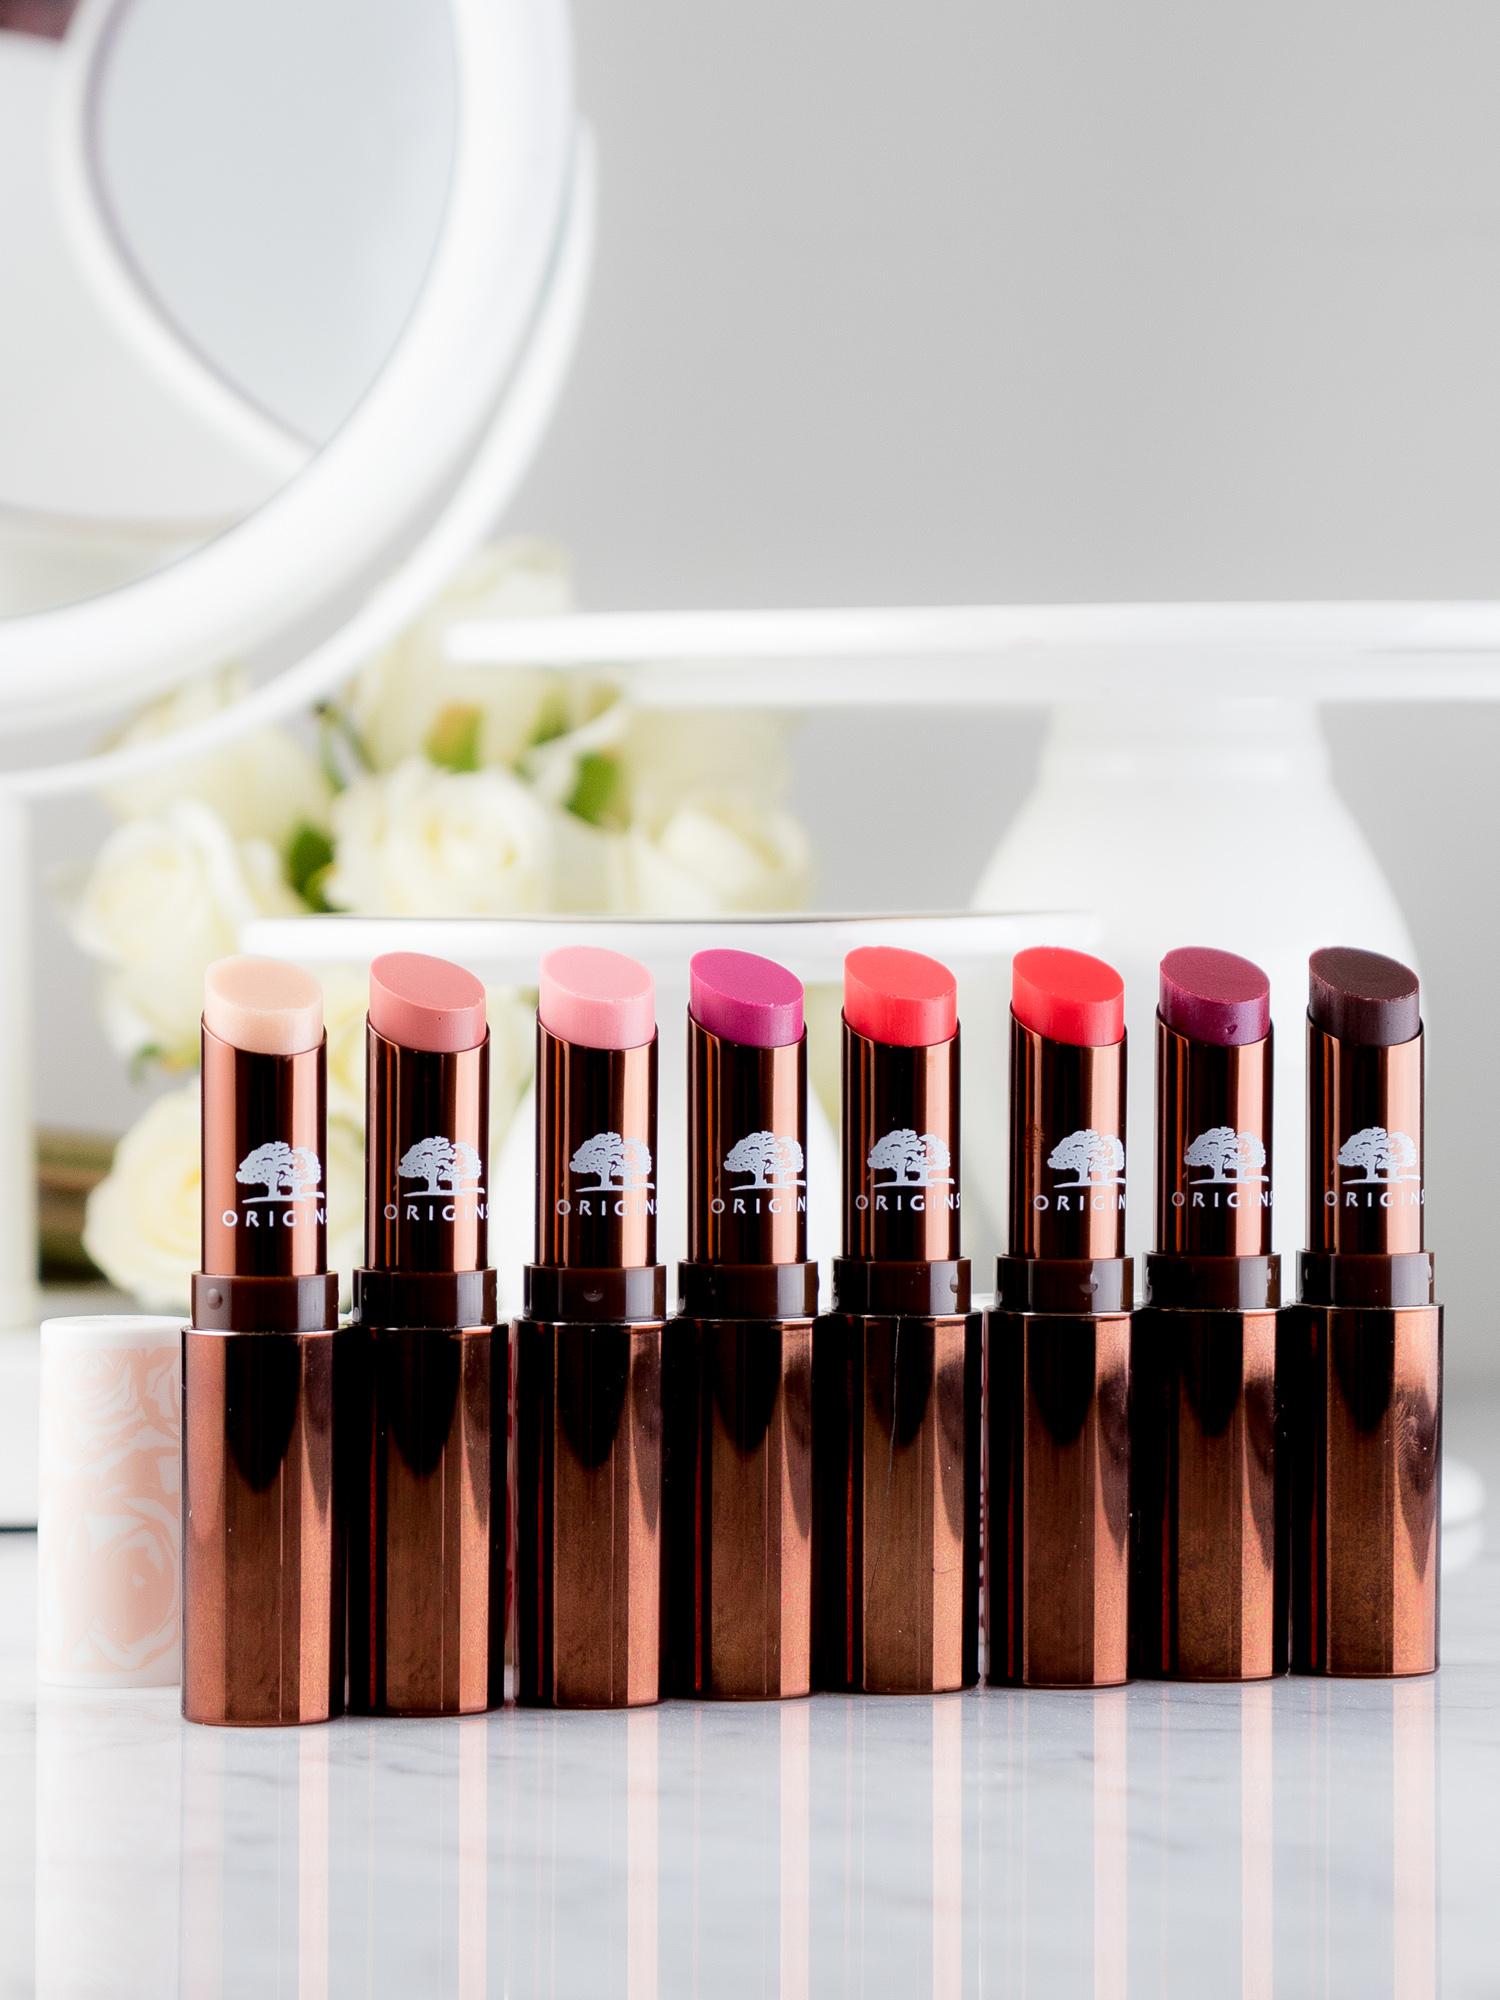 NEW: Origins Blooming Lips Lip Balm